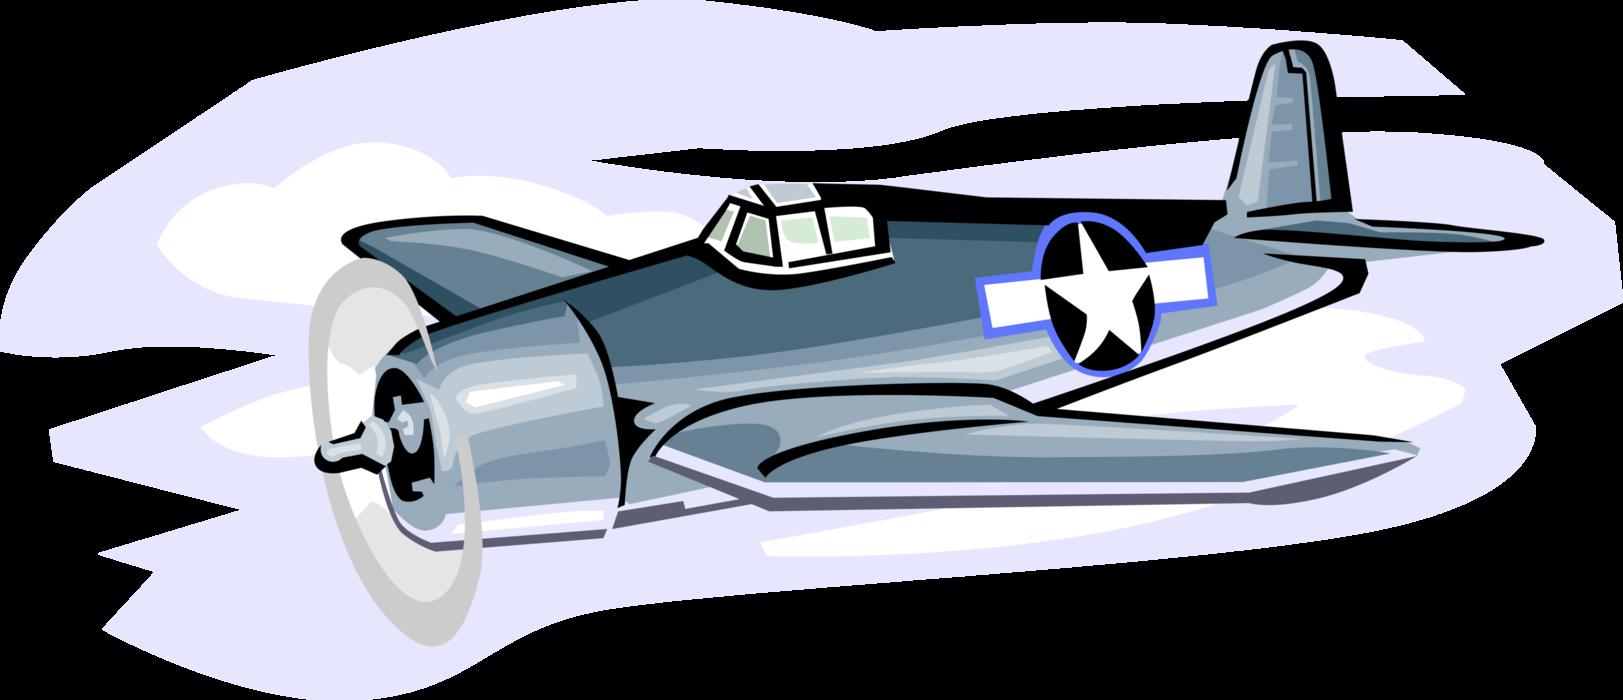 clipart freeuse library Grumman f wildcat aircraft. Vector aviation illustrator